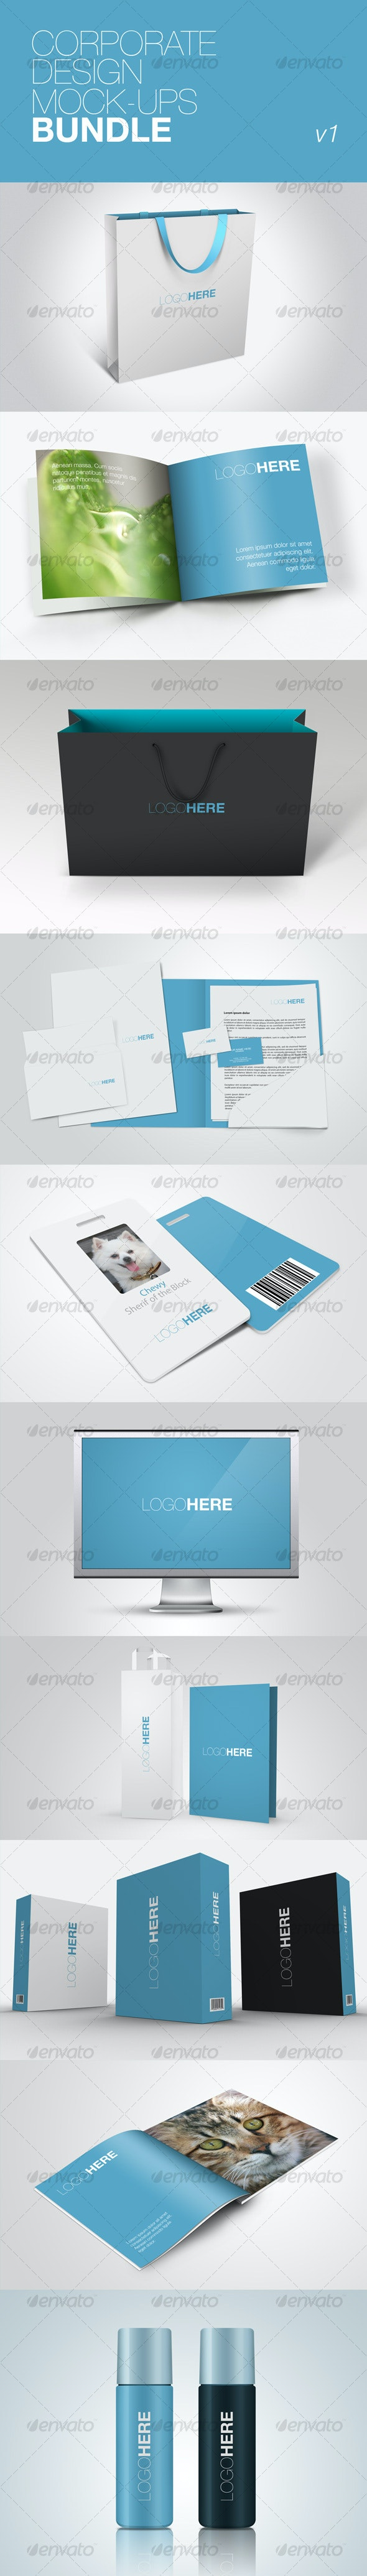 Corporate Design Mock-ups Bundle v1 - Miscellaneous Packaging